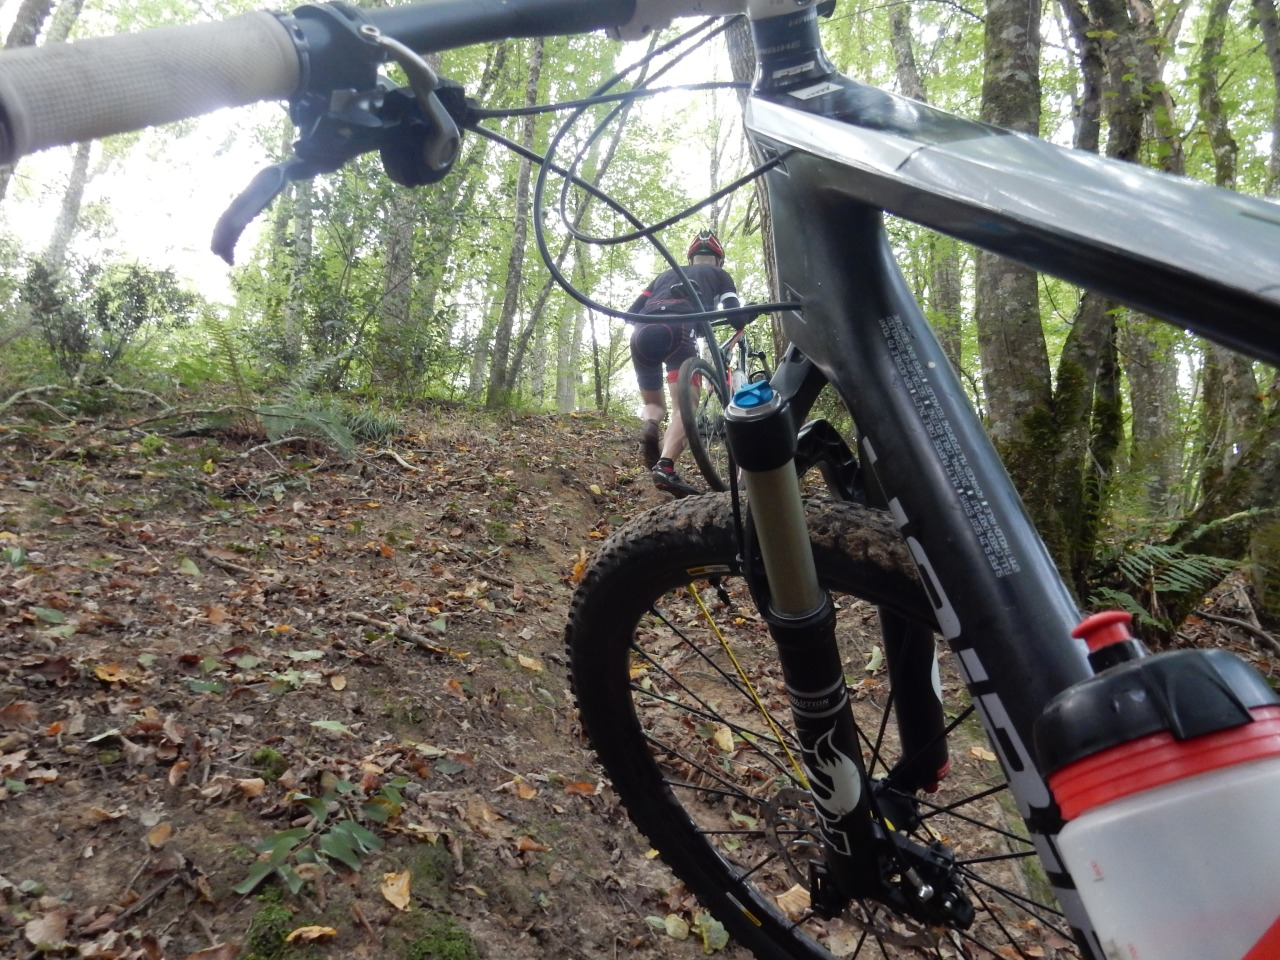 Sortie VTT typé enduro, challenges en vue. 15km de singles en forêt(37)